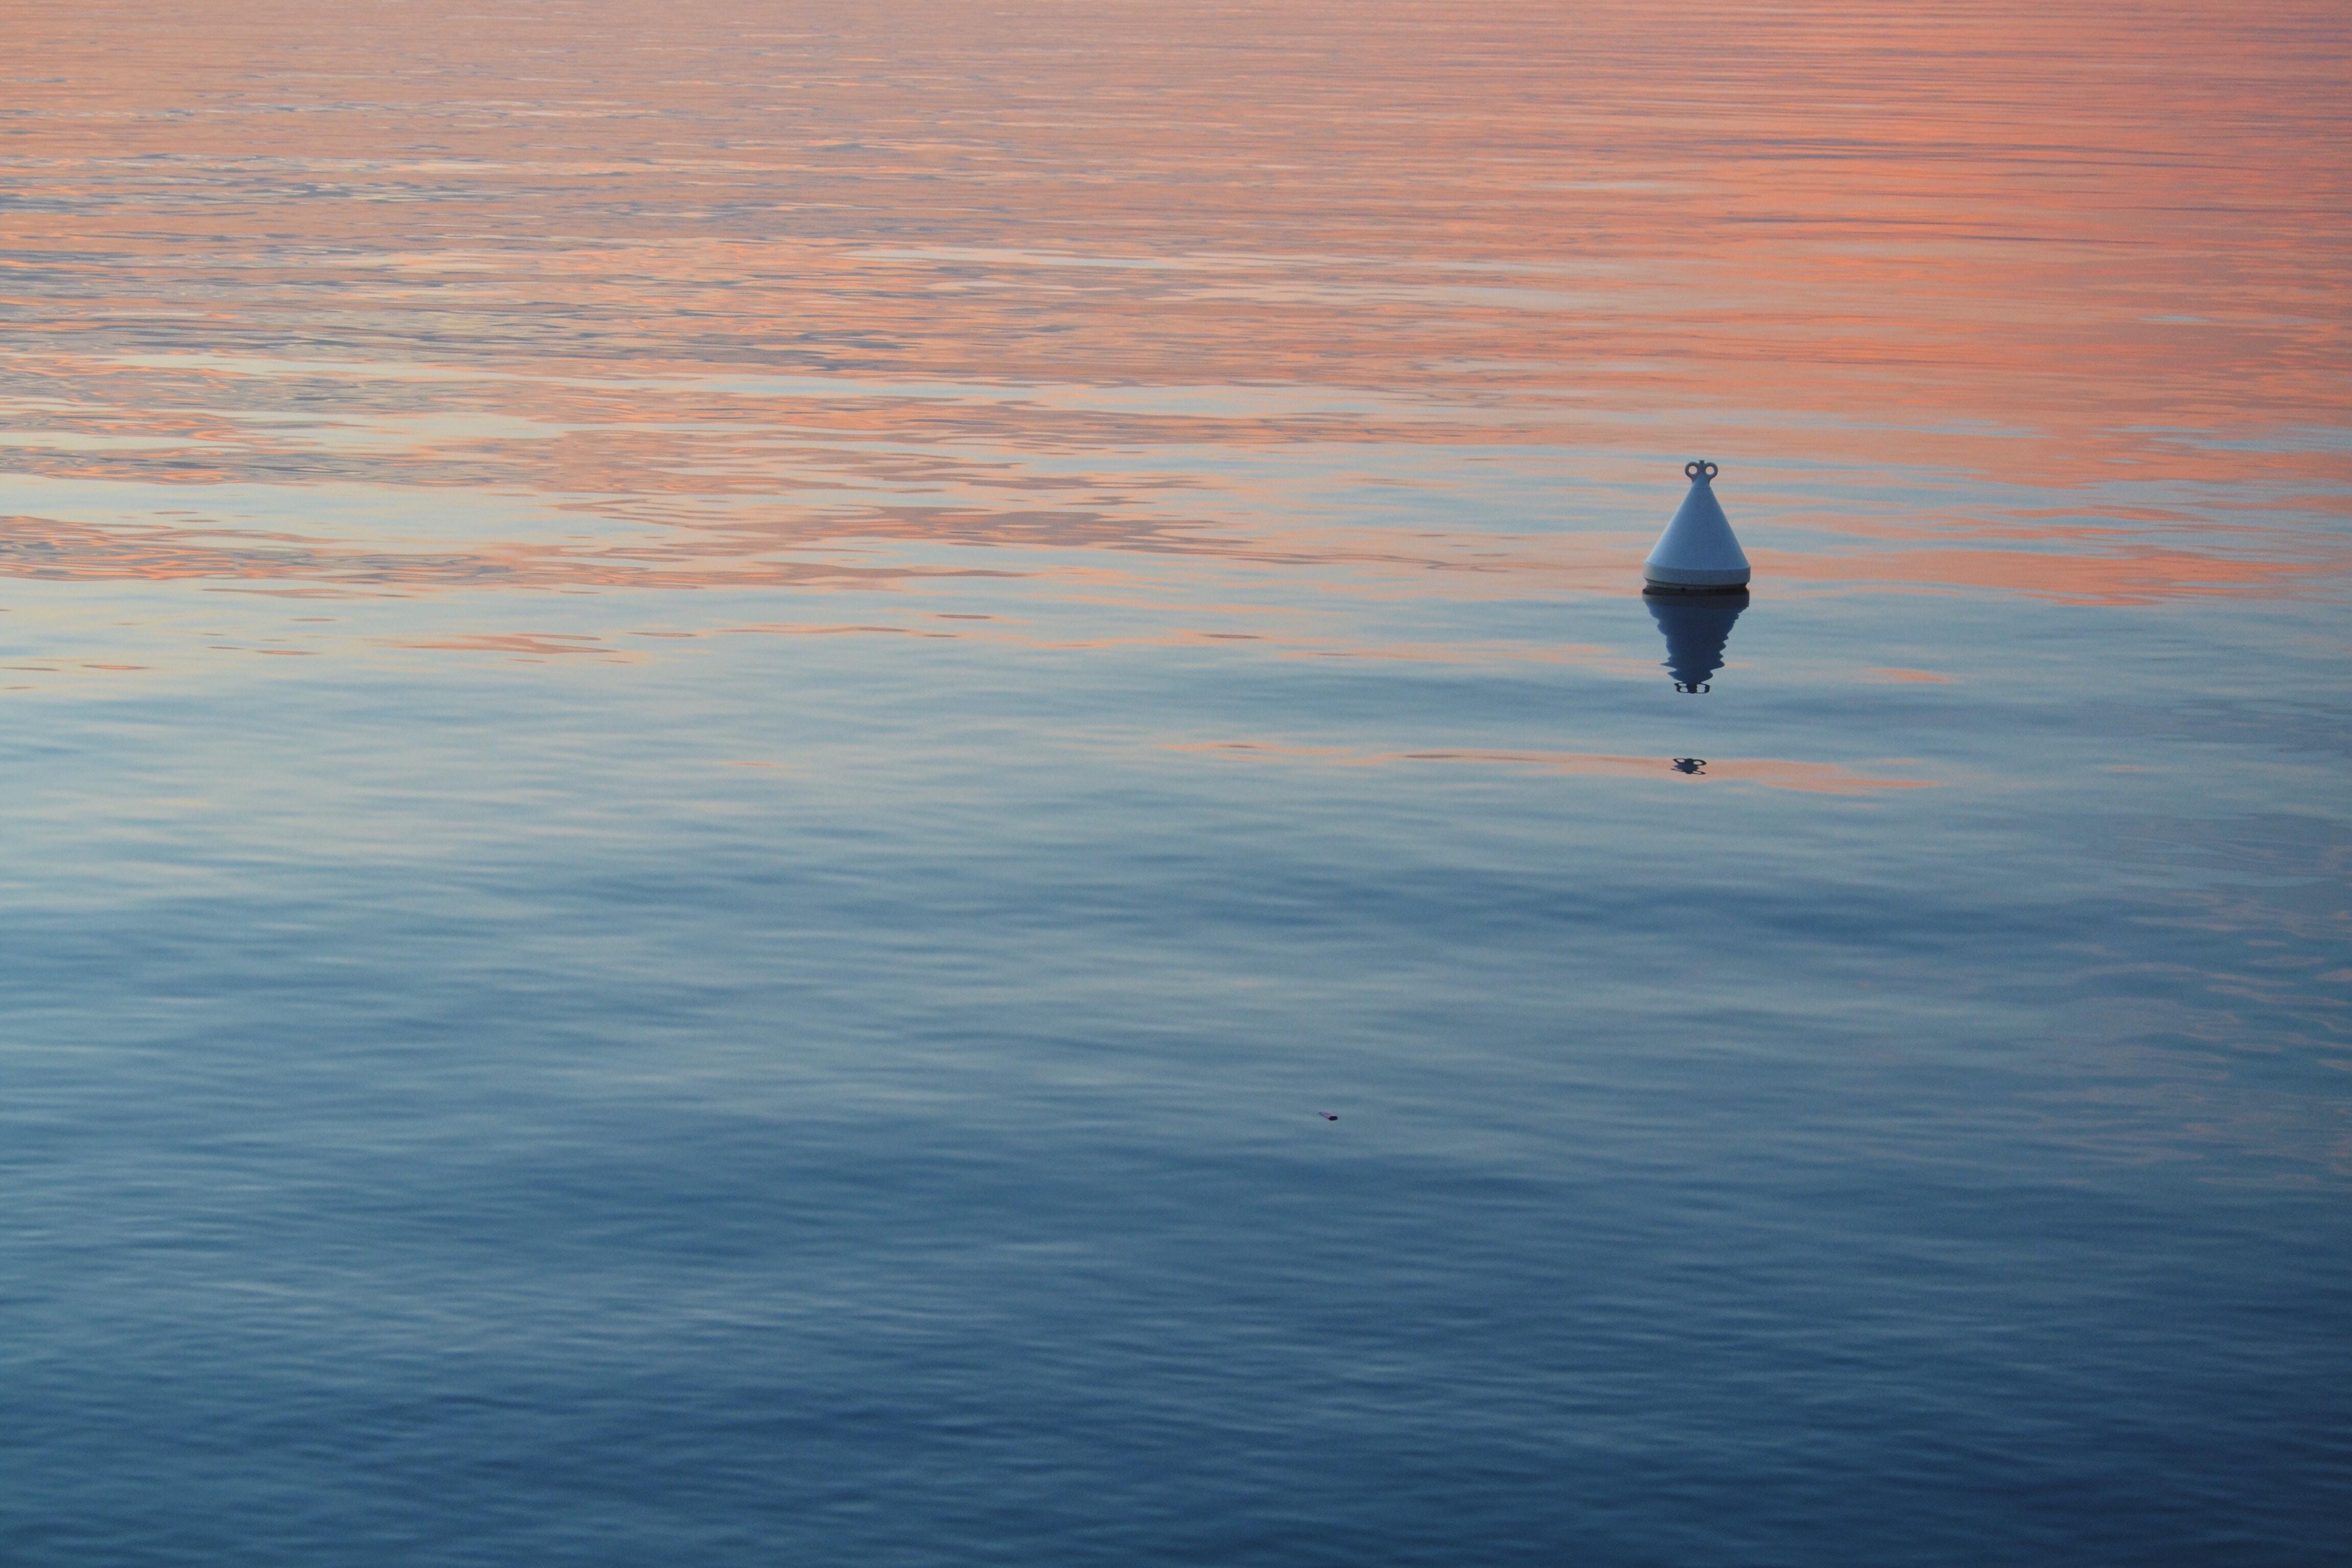 triangular metal floating in water